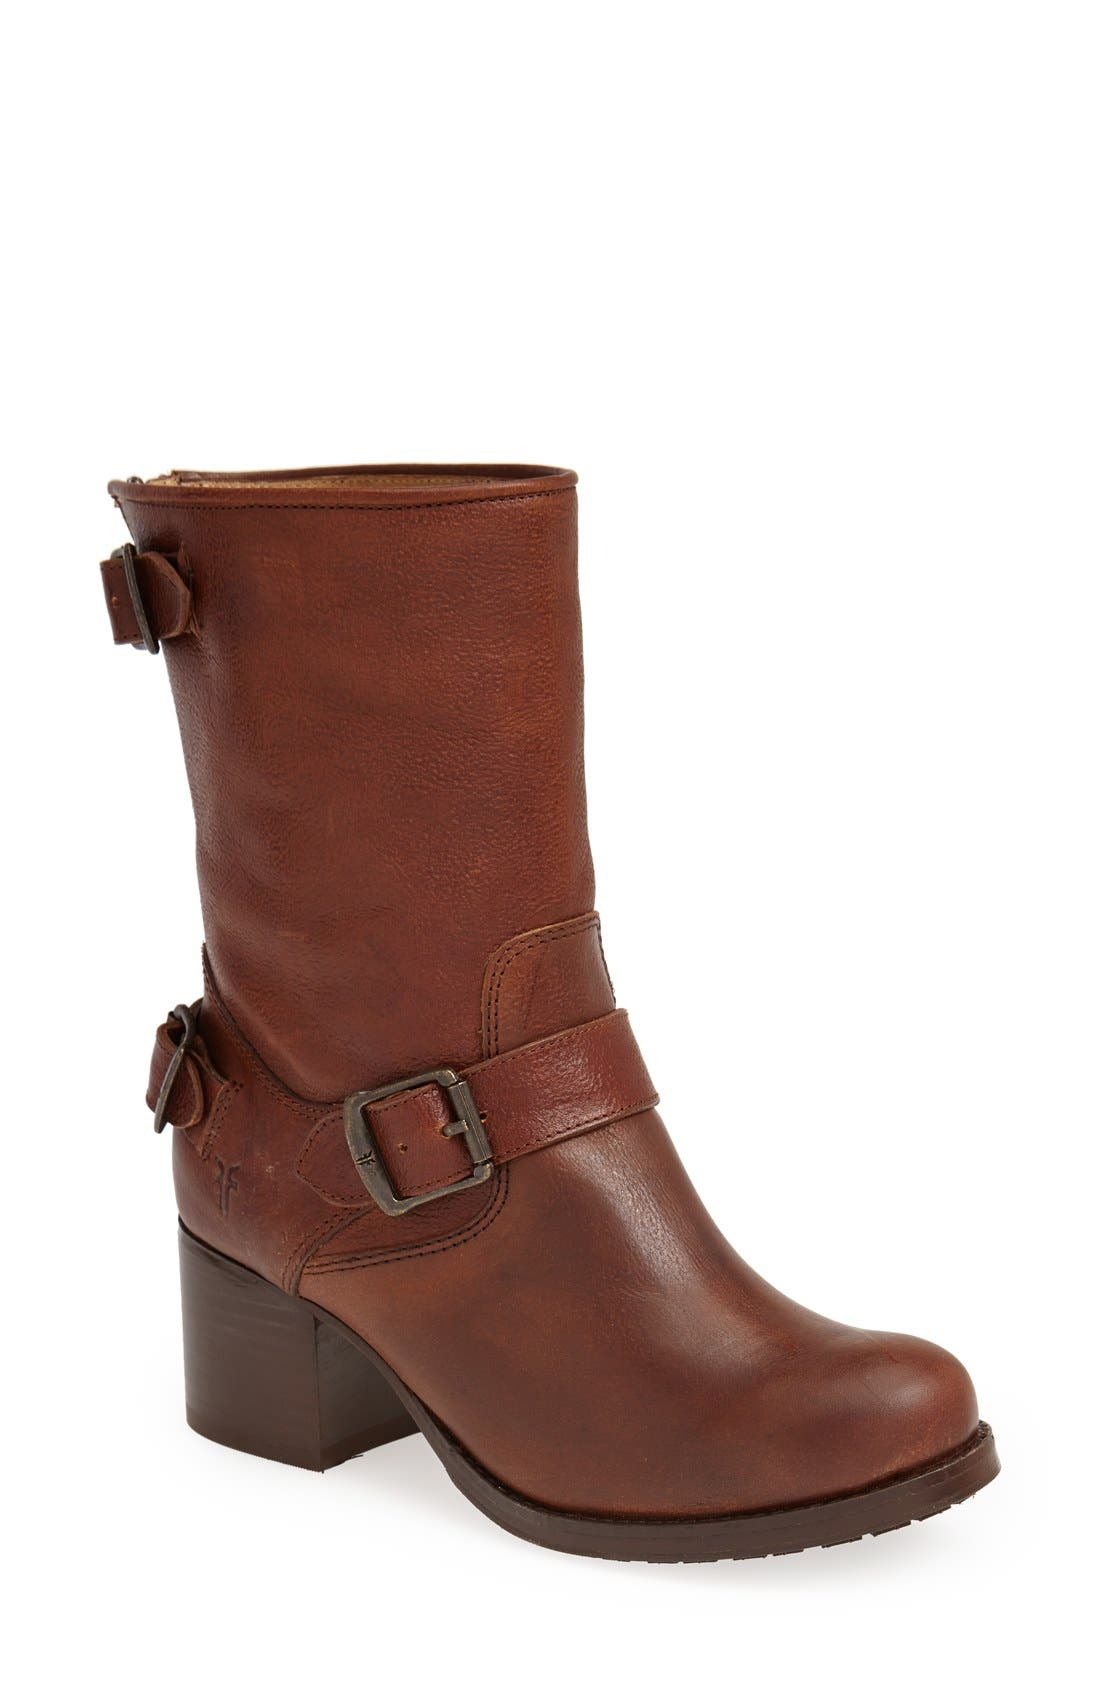 Alternate Image 1 Selected - Frye 'Vera' Short Boot (Women)